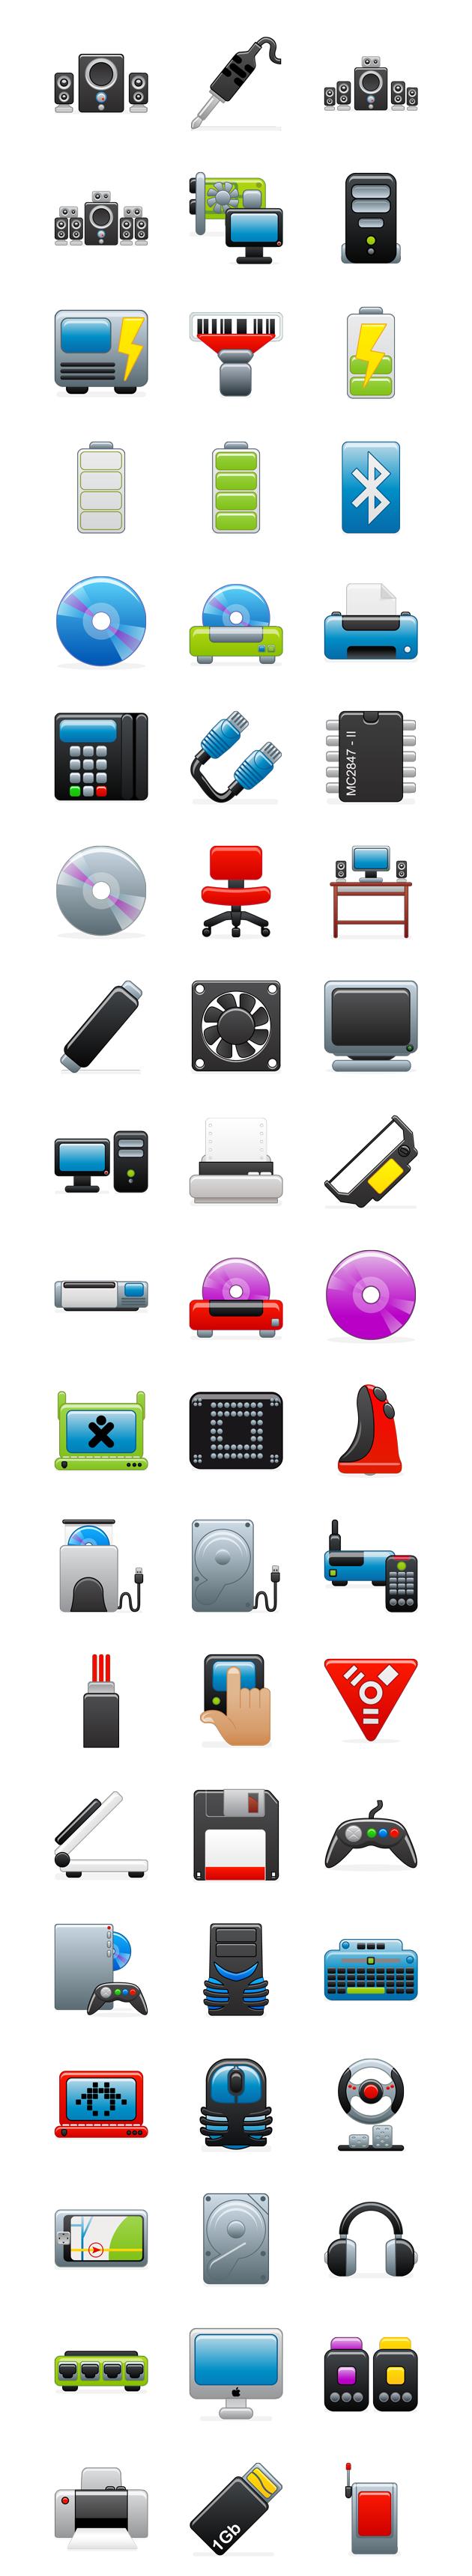 computer_gadgets_communications_128